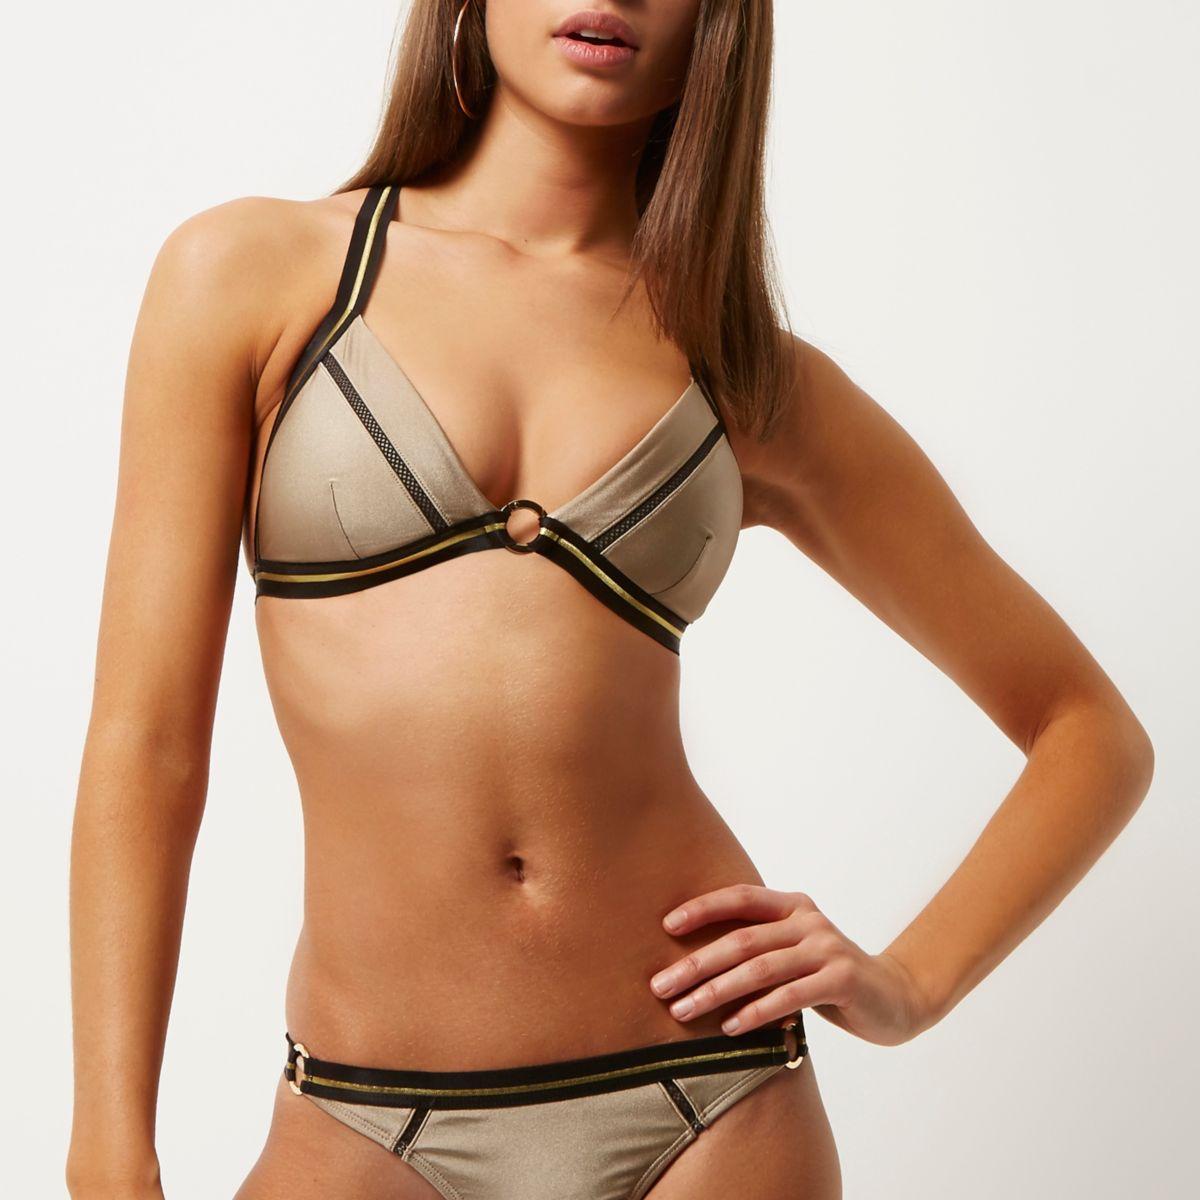 Gold strappy ring bikini top